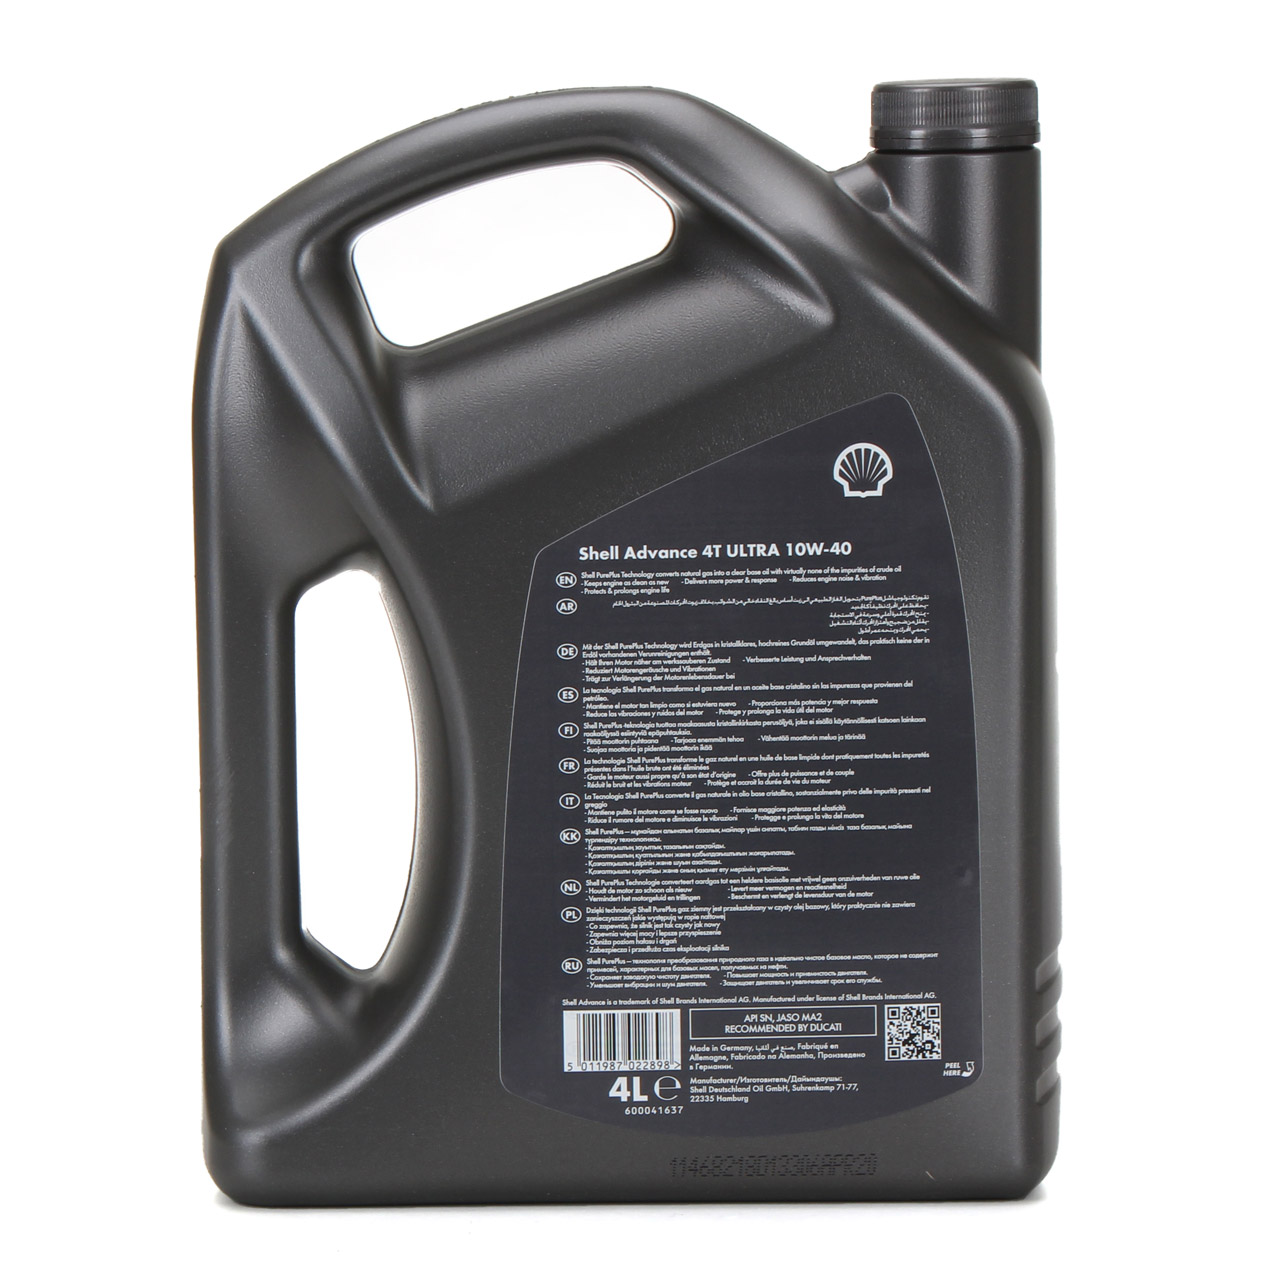 SHELL Motoröl Motorradöl Öl ADVANCE ULTRA 4T 4-TAKT 10W-40 API SN JASO MA-2 - 4L 4 Liter